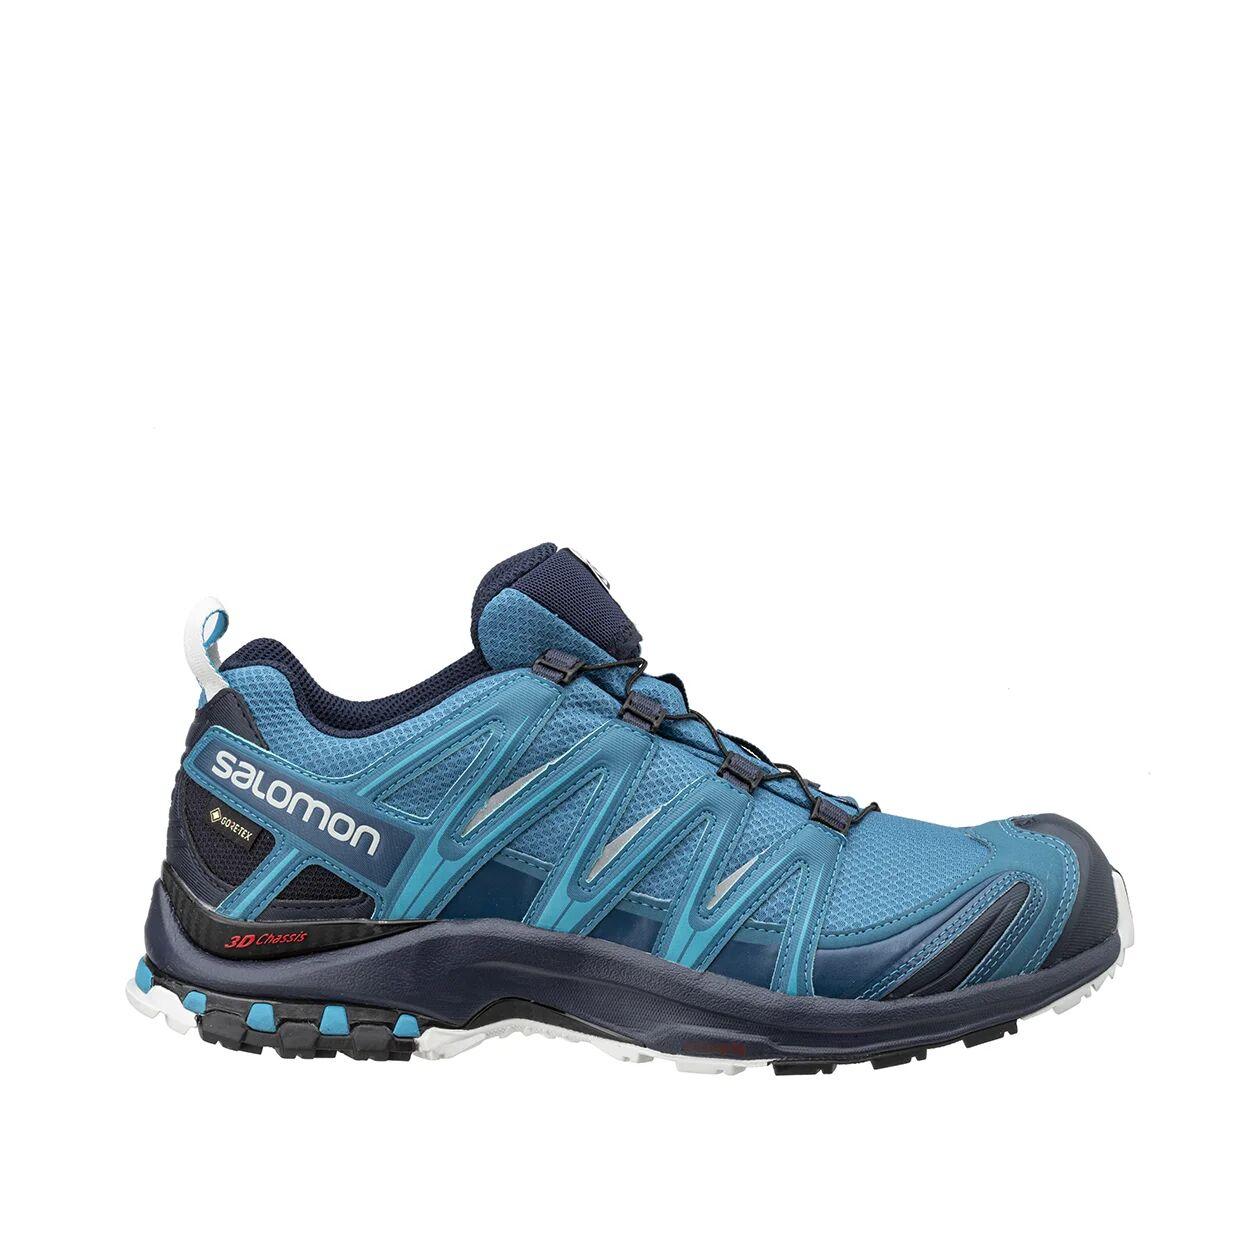 salomon xa pro 3d gtx - scarpe trail running azzure e blu navy